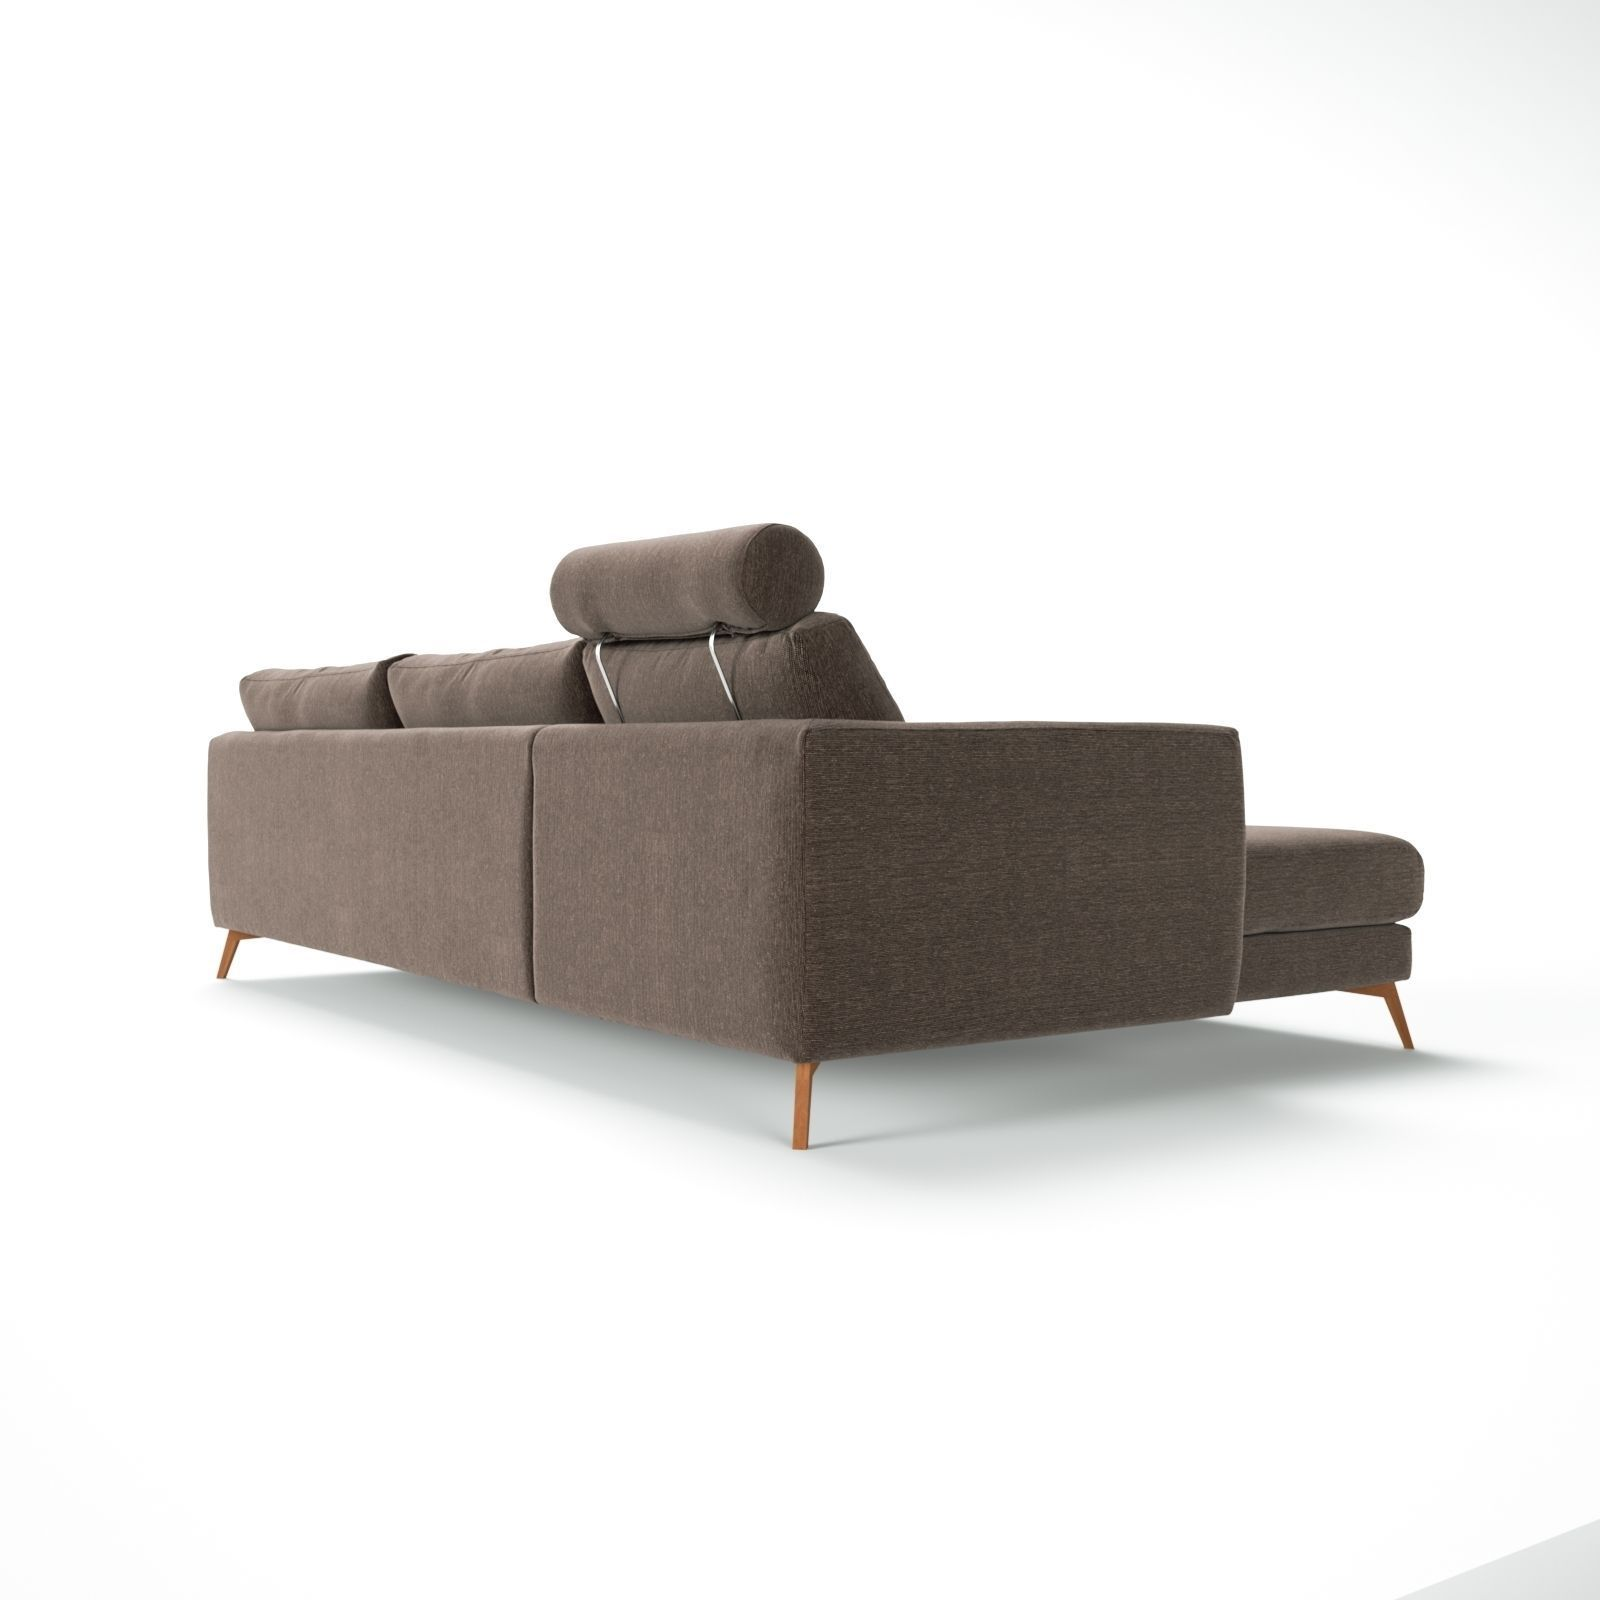 Boconcept fargo sofa 3d model max for Model furniture